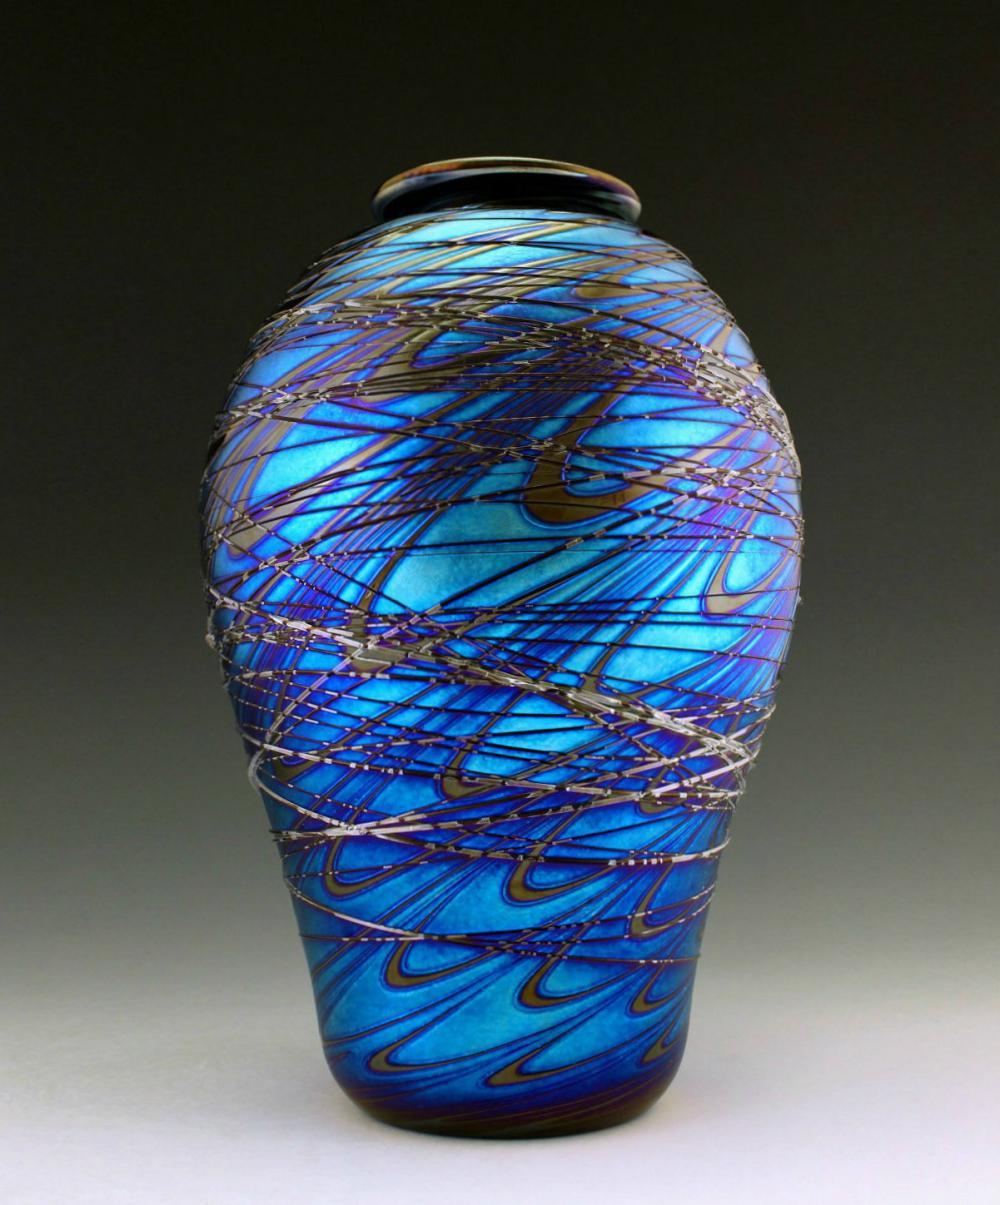 Bohemian Art Nouveau Iridescent Glass Vase Glamorous Loetz or Tyffany Studios Decor